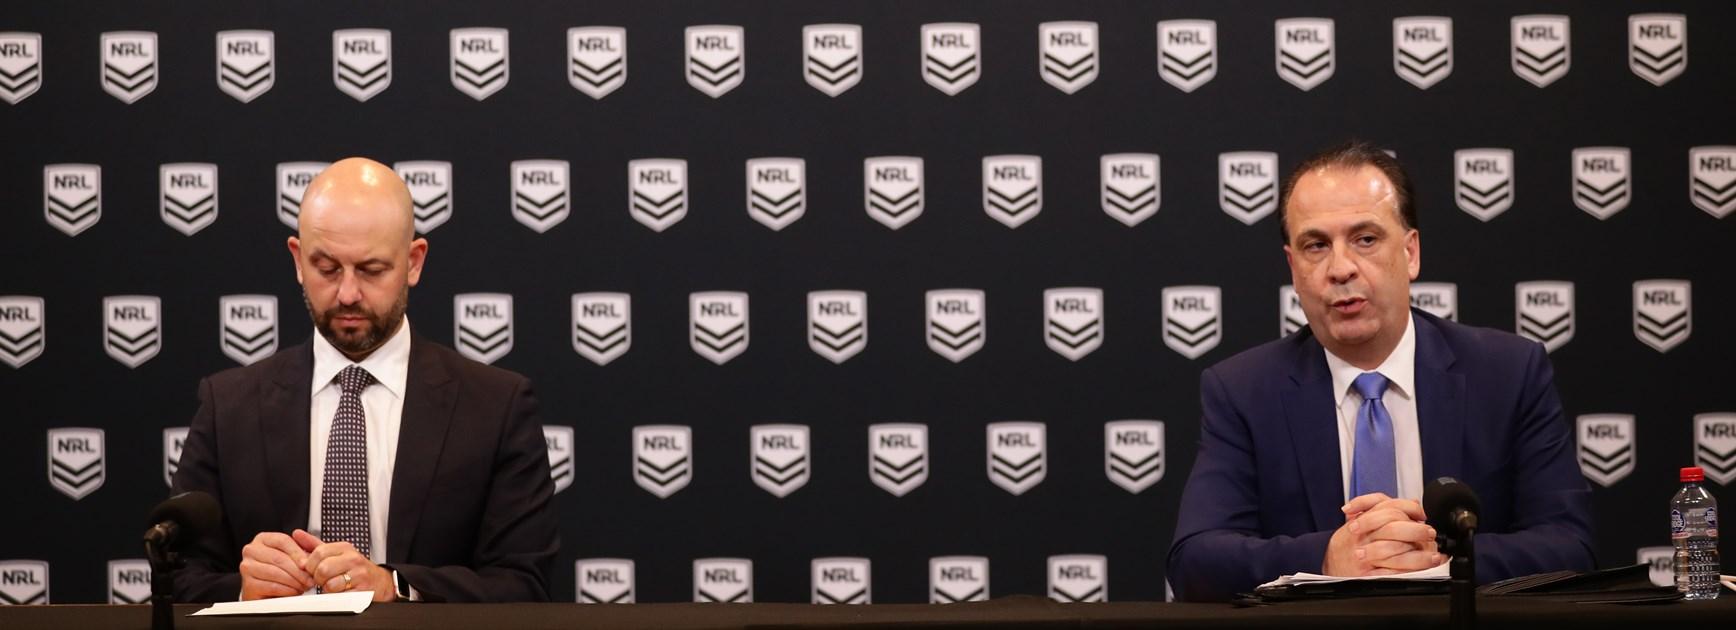 NRL season suspended: Greenberg, V'landys statements